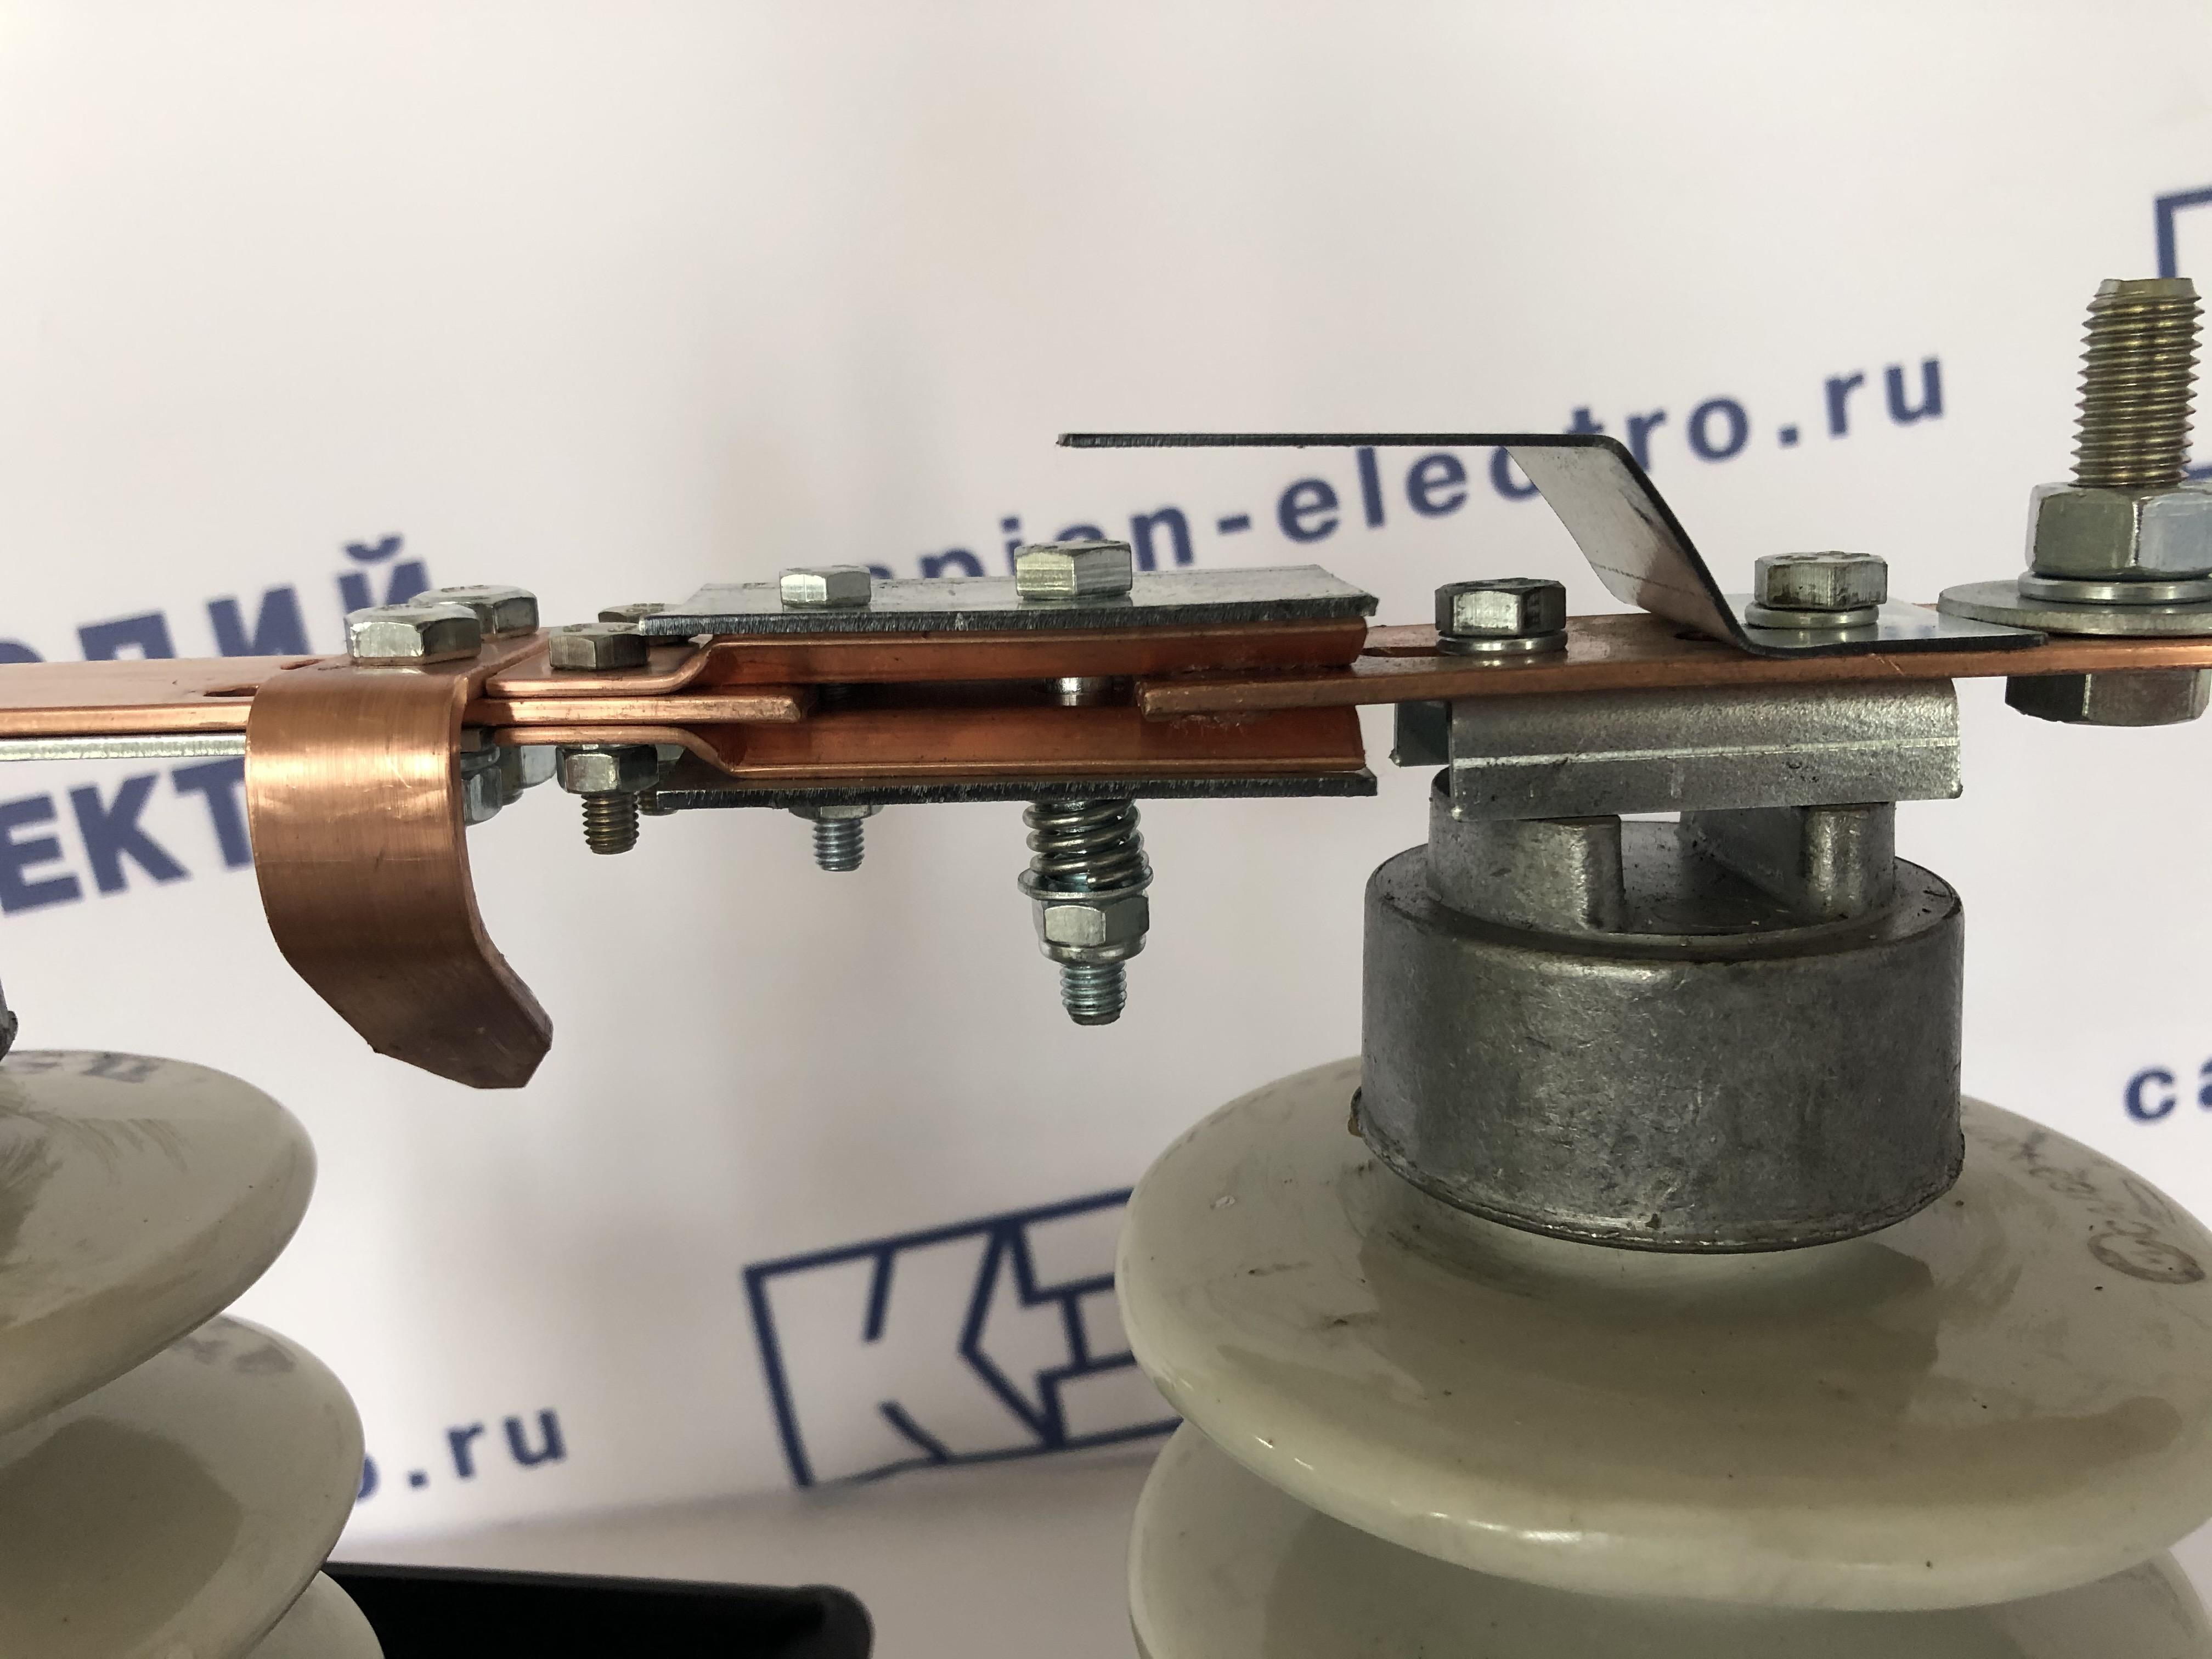 РЛНД-1-10 IV/200